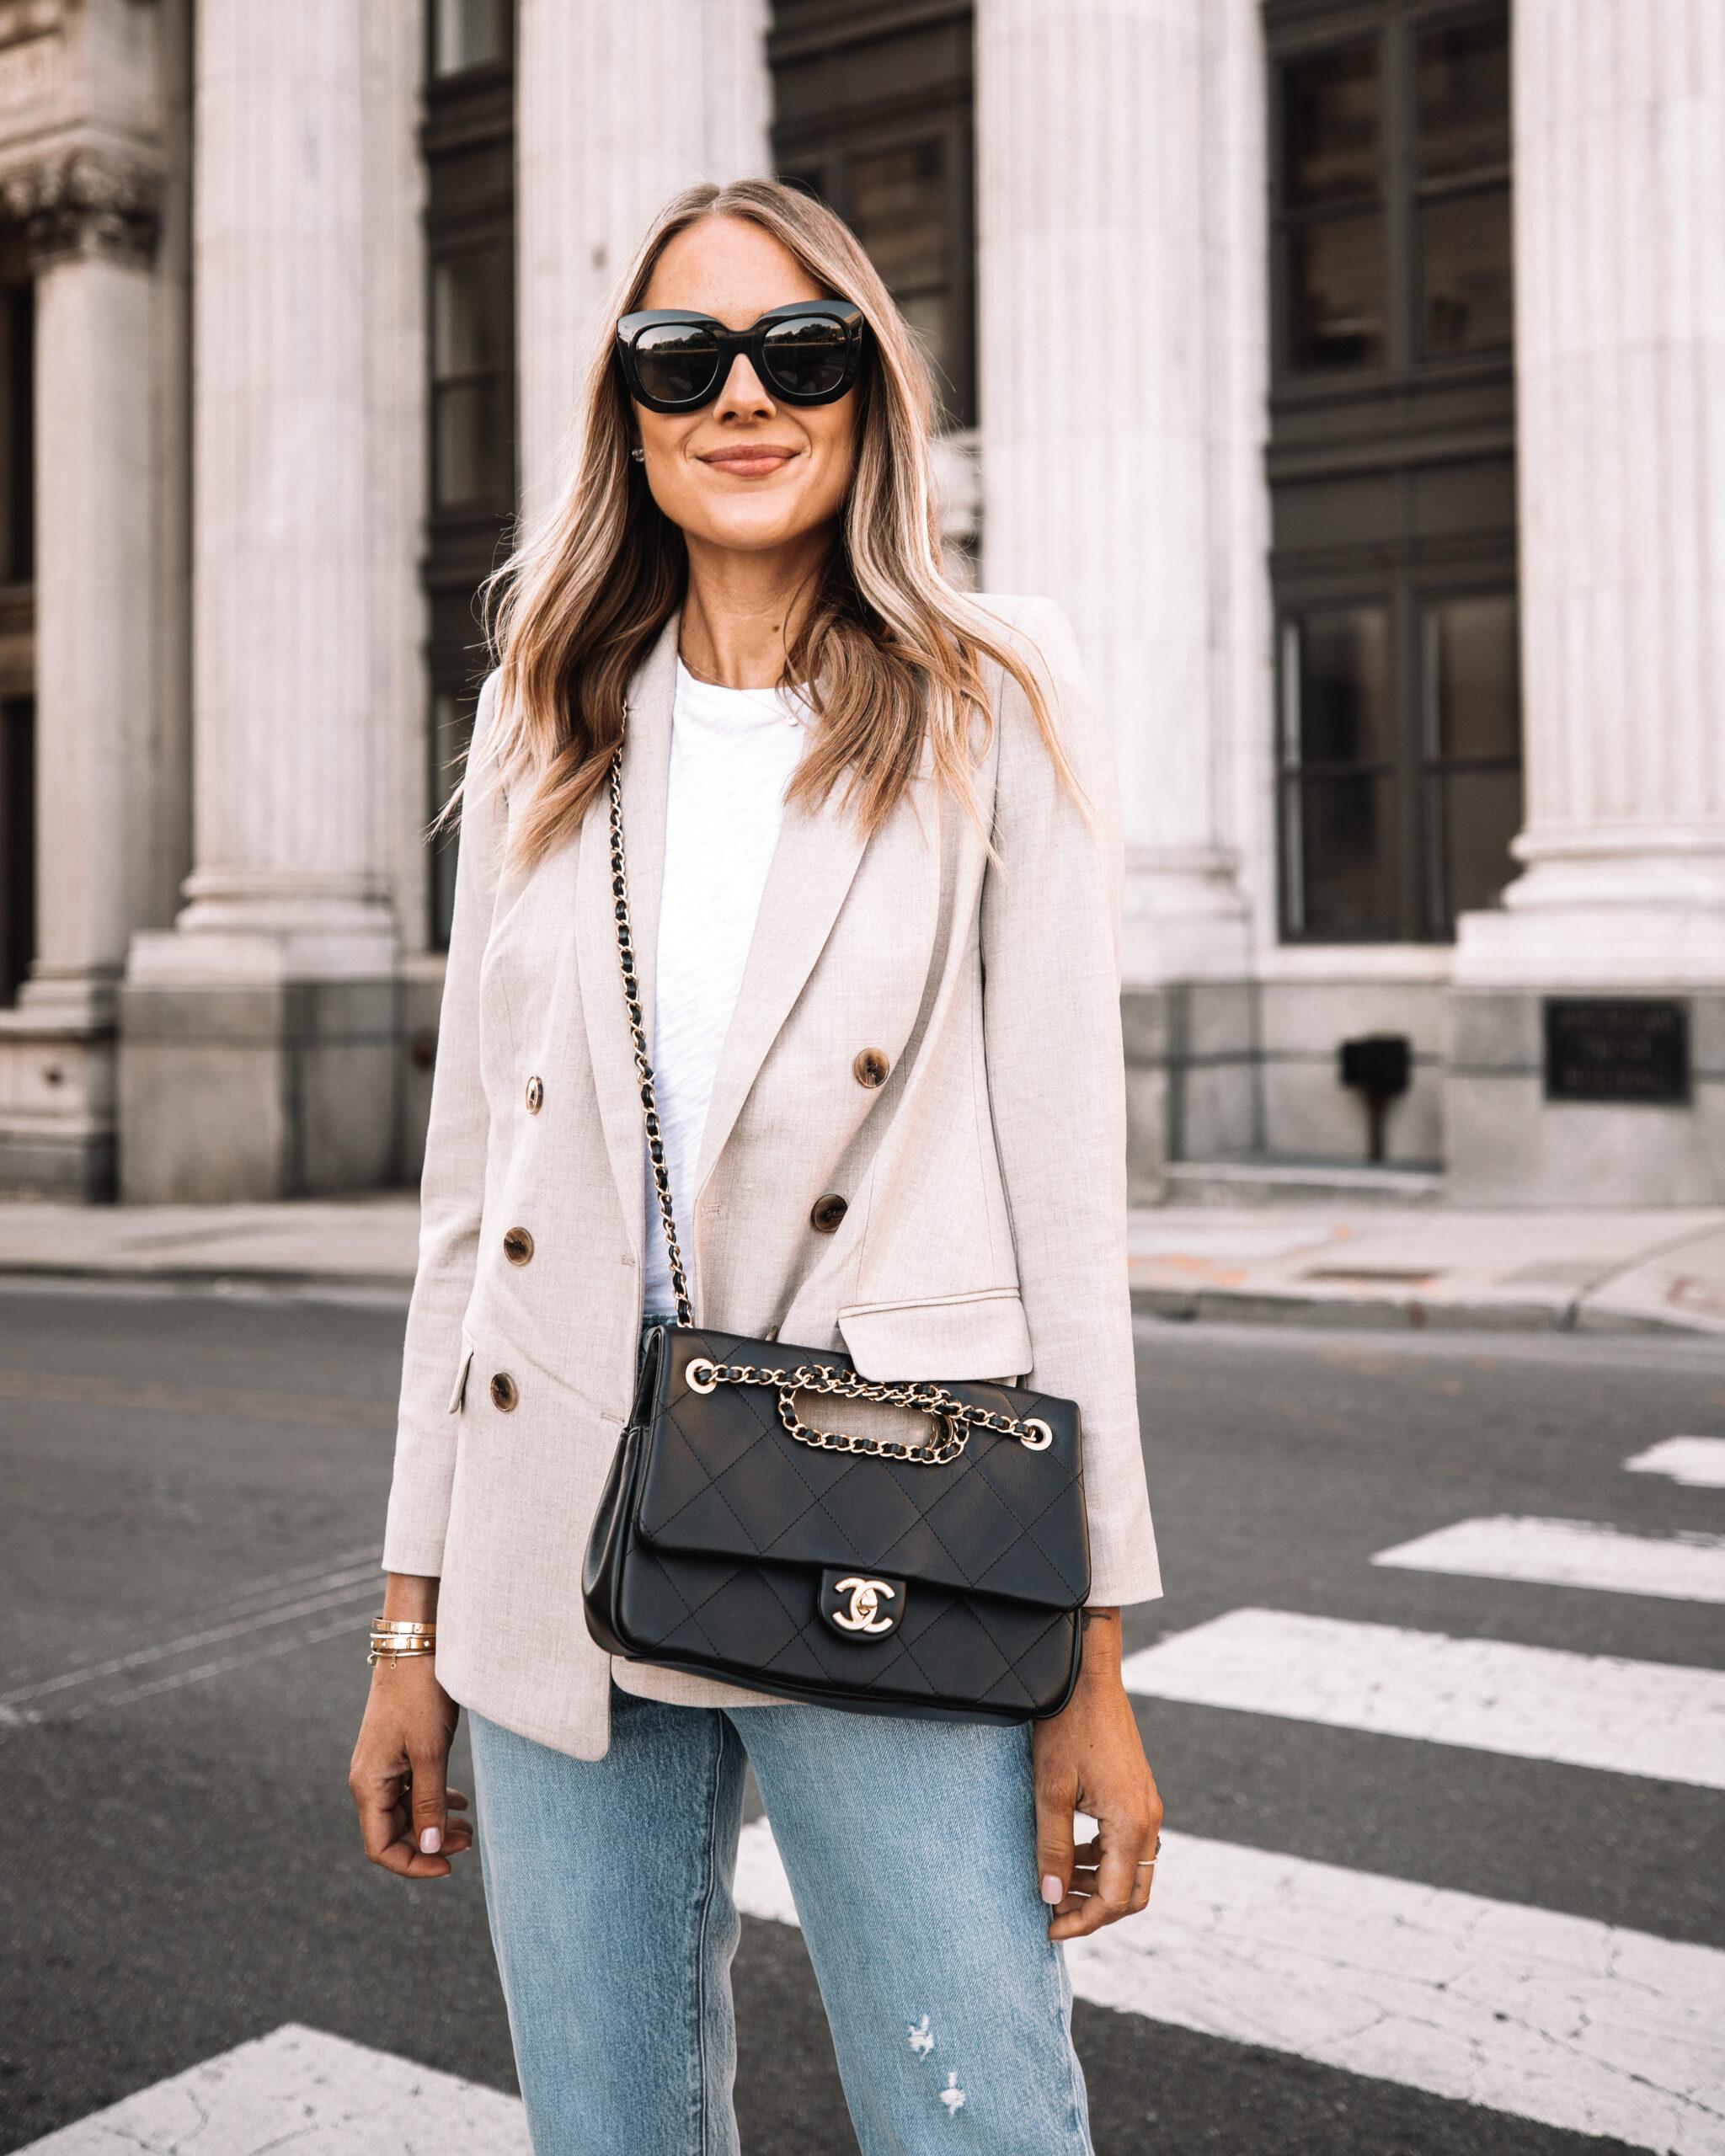 Fashion Jackson Wearing Express Beige Blazer Outfit White Tshirt Jeans Black Chain Chanel Handbag Black Celine Sunglasses